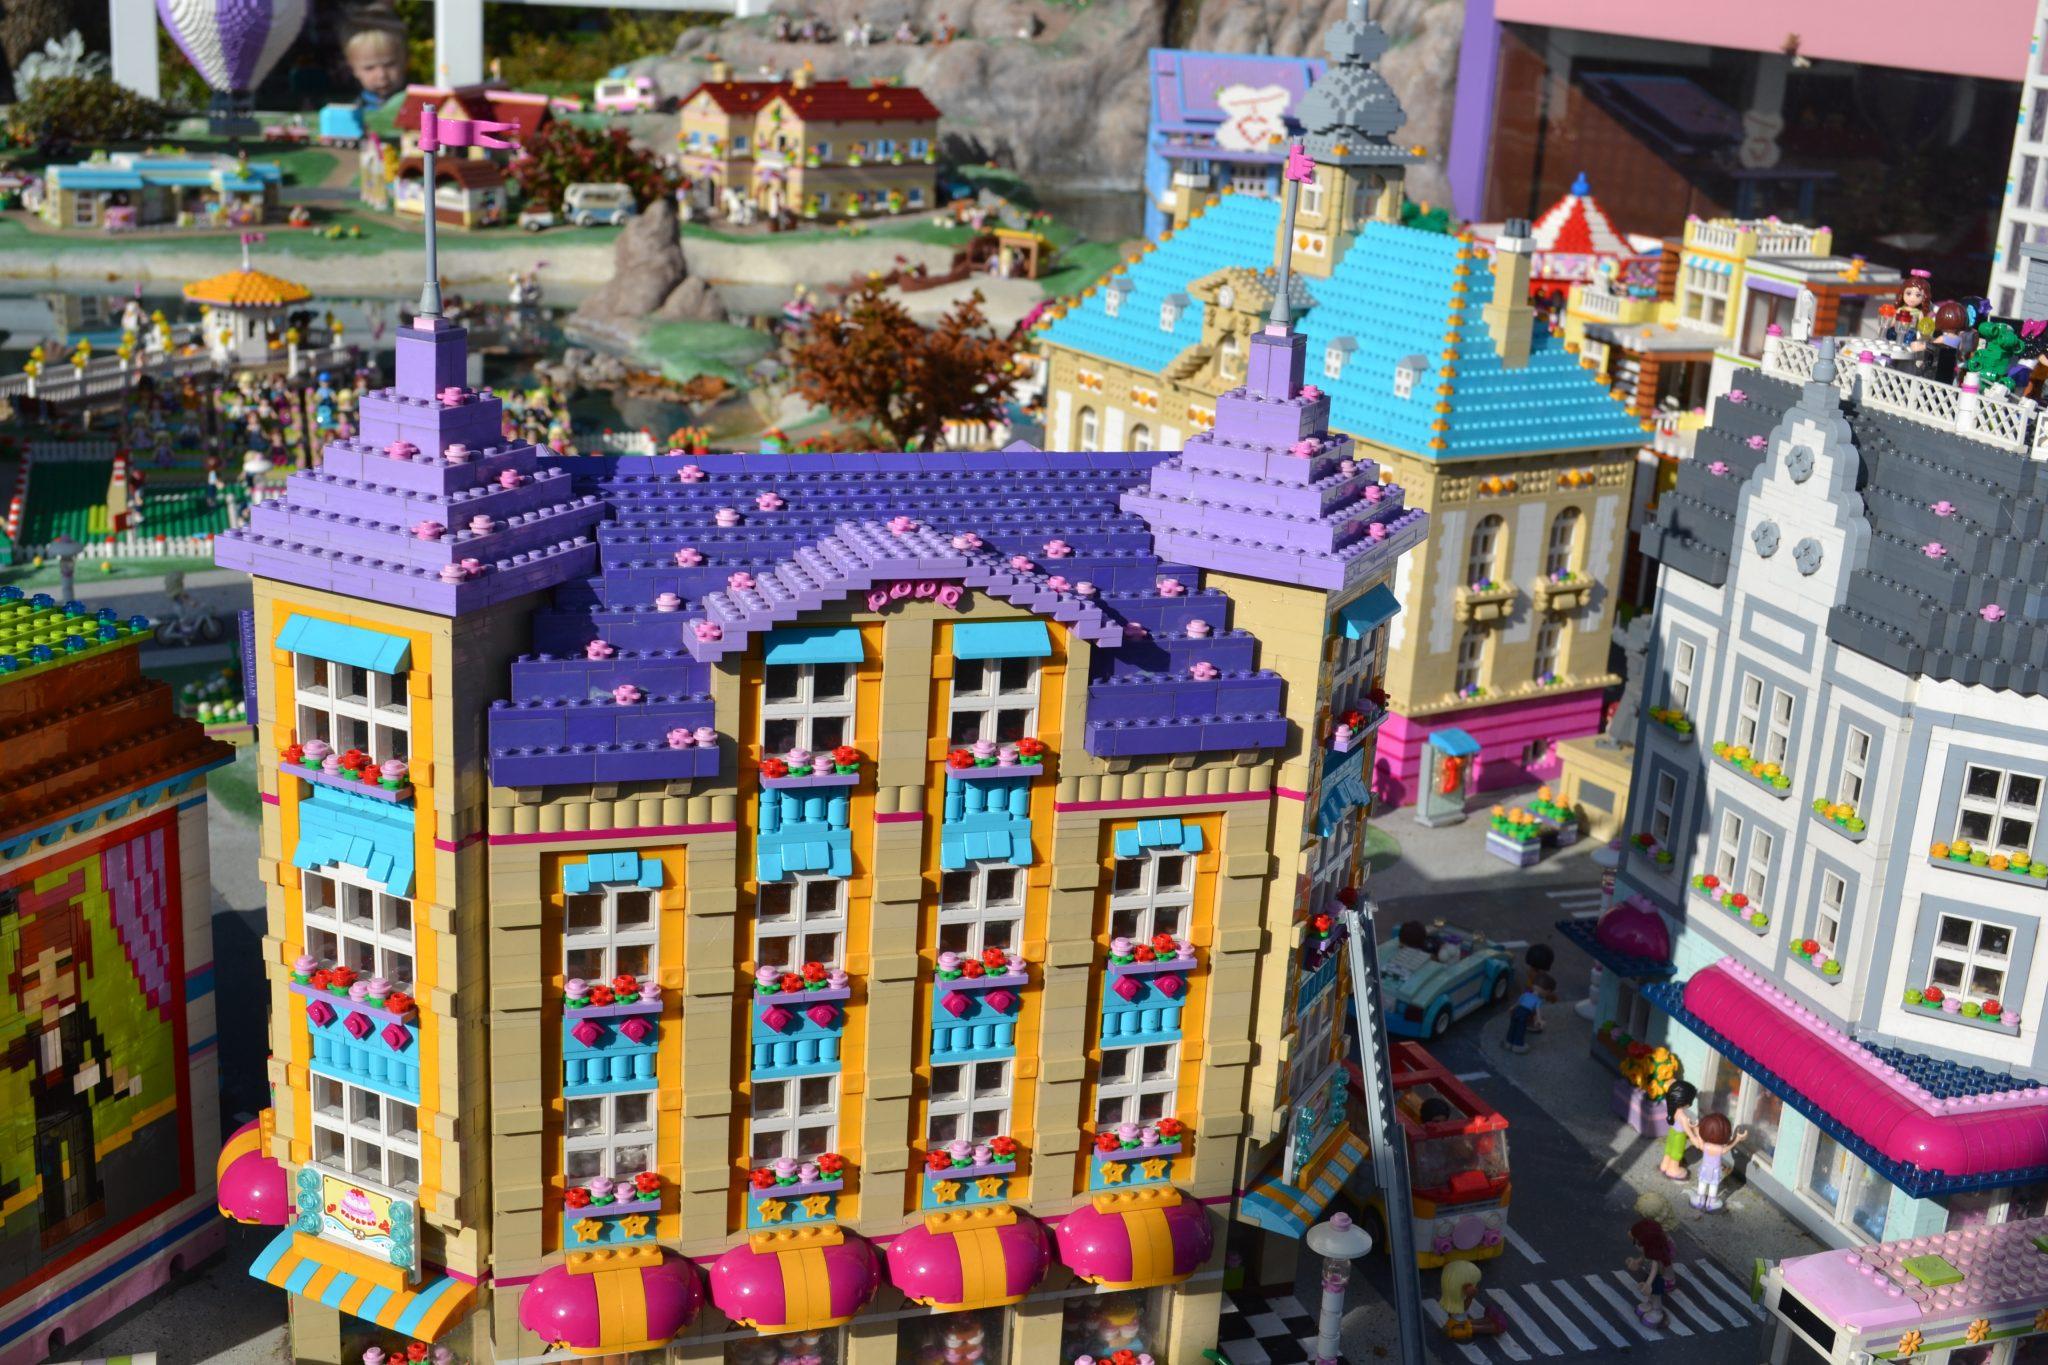 Legoland | Dänemark 2015 - DSC 0042